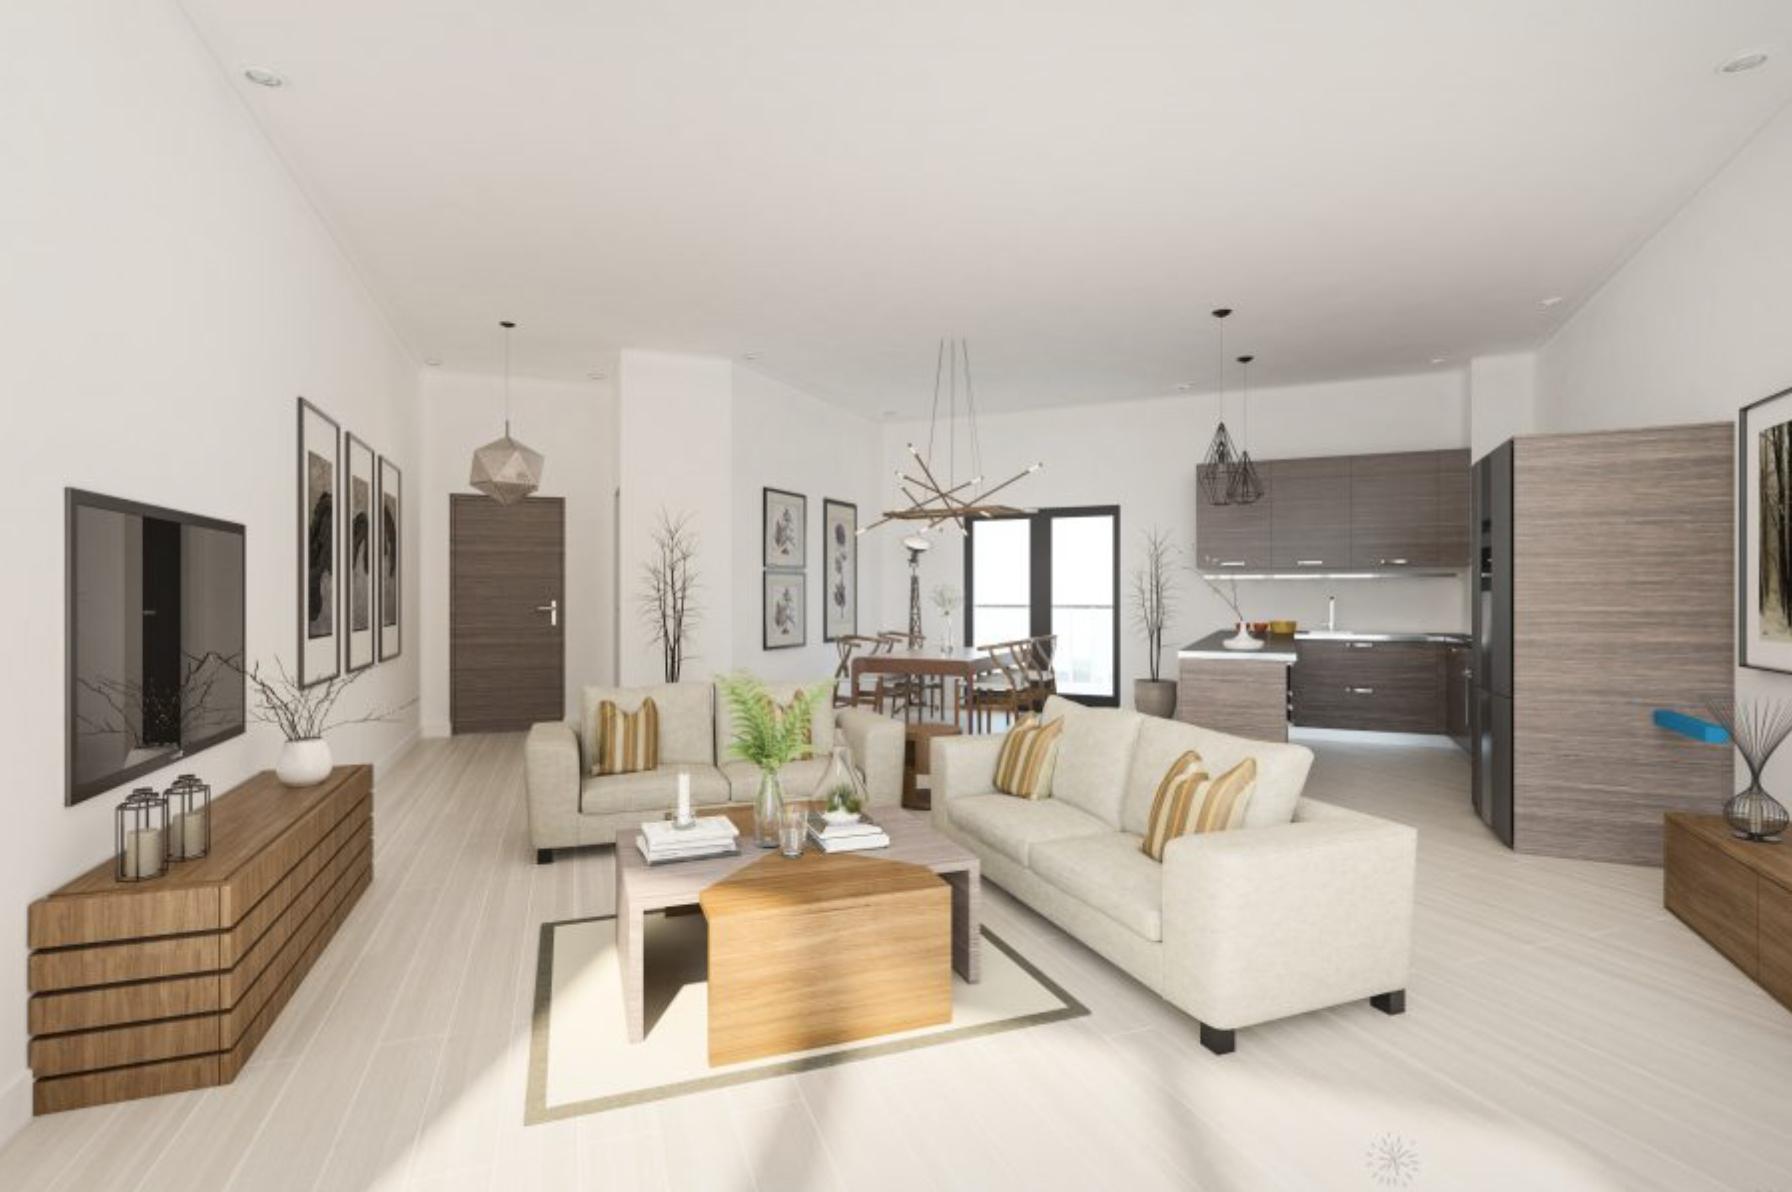 2BR/2BTH Living Room Area